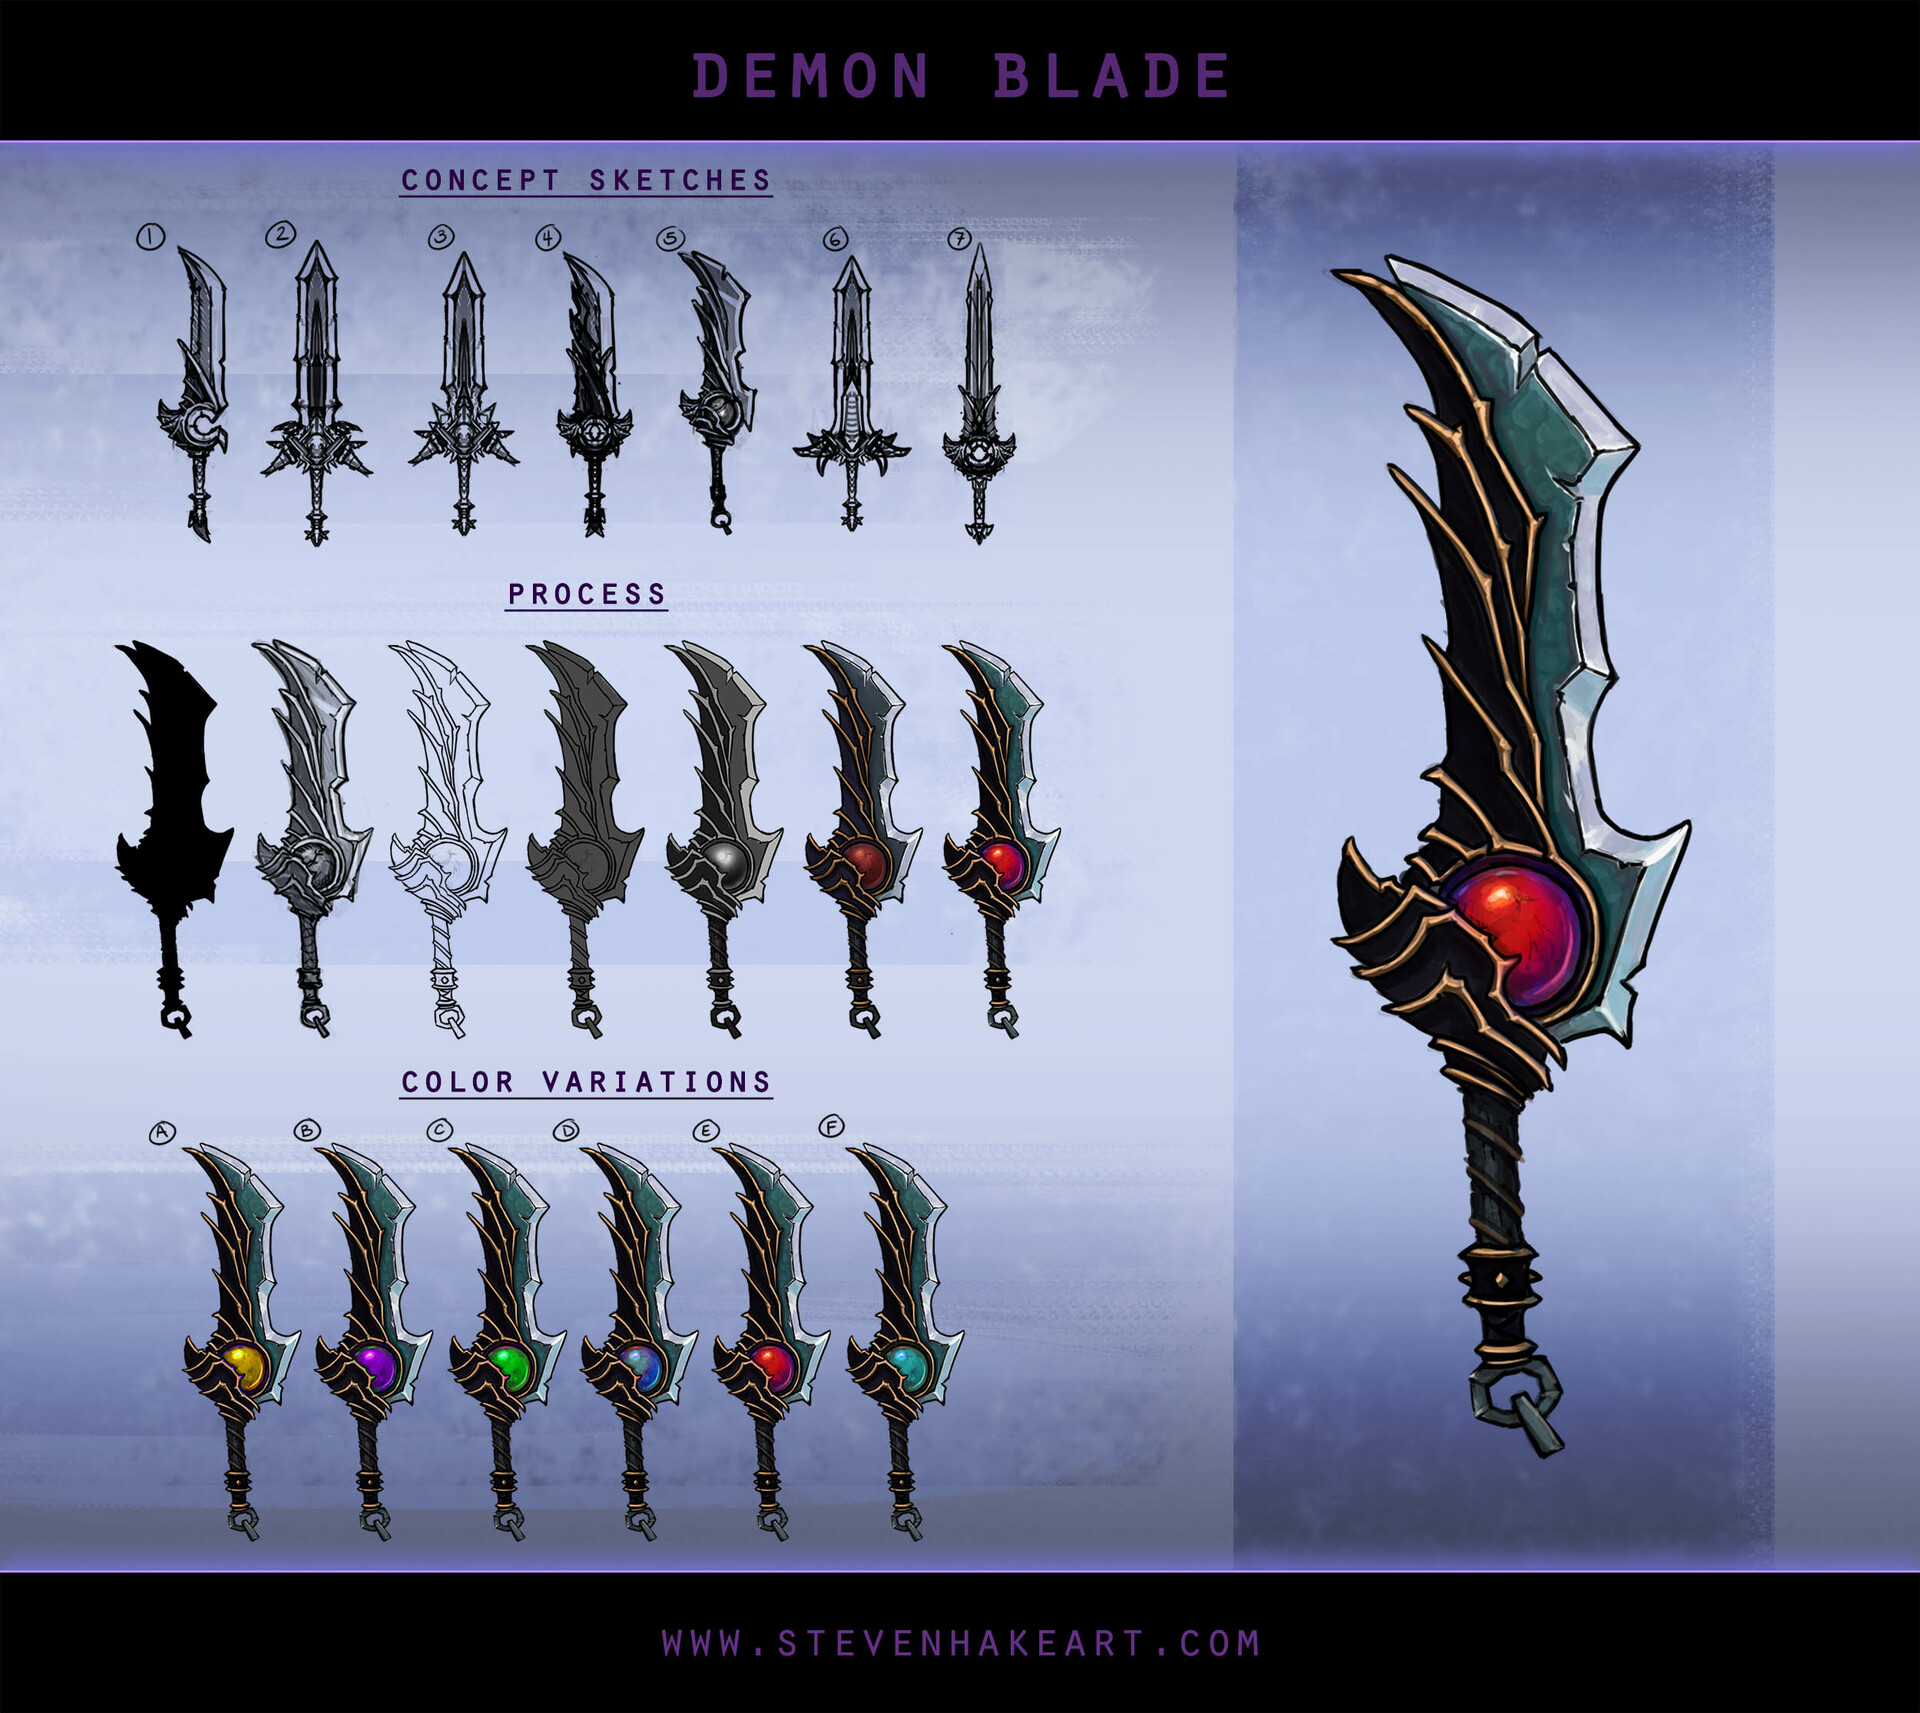 Steven hake demonblade concepts